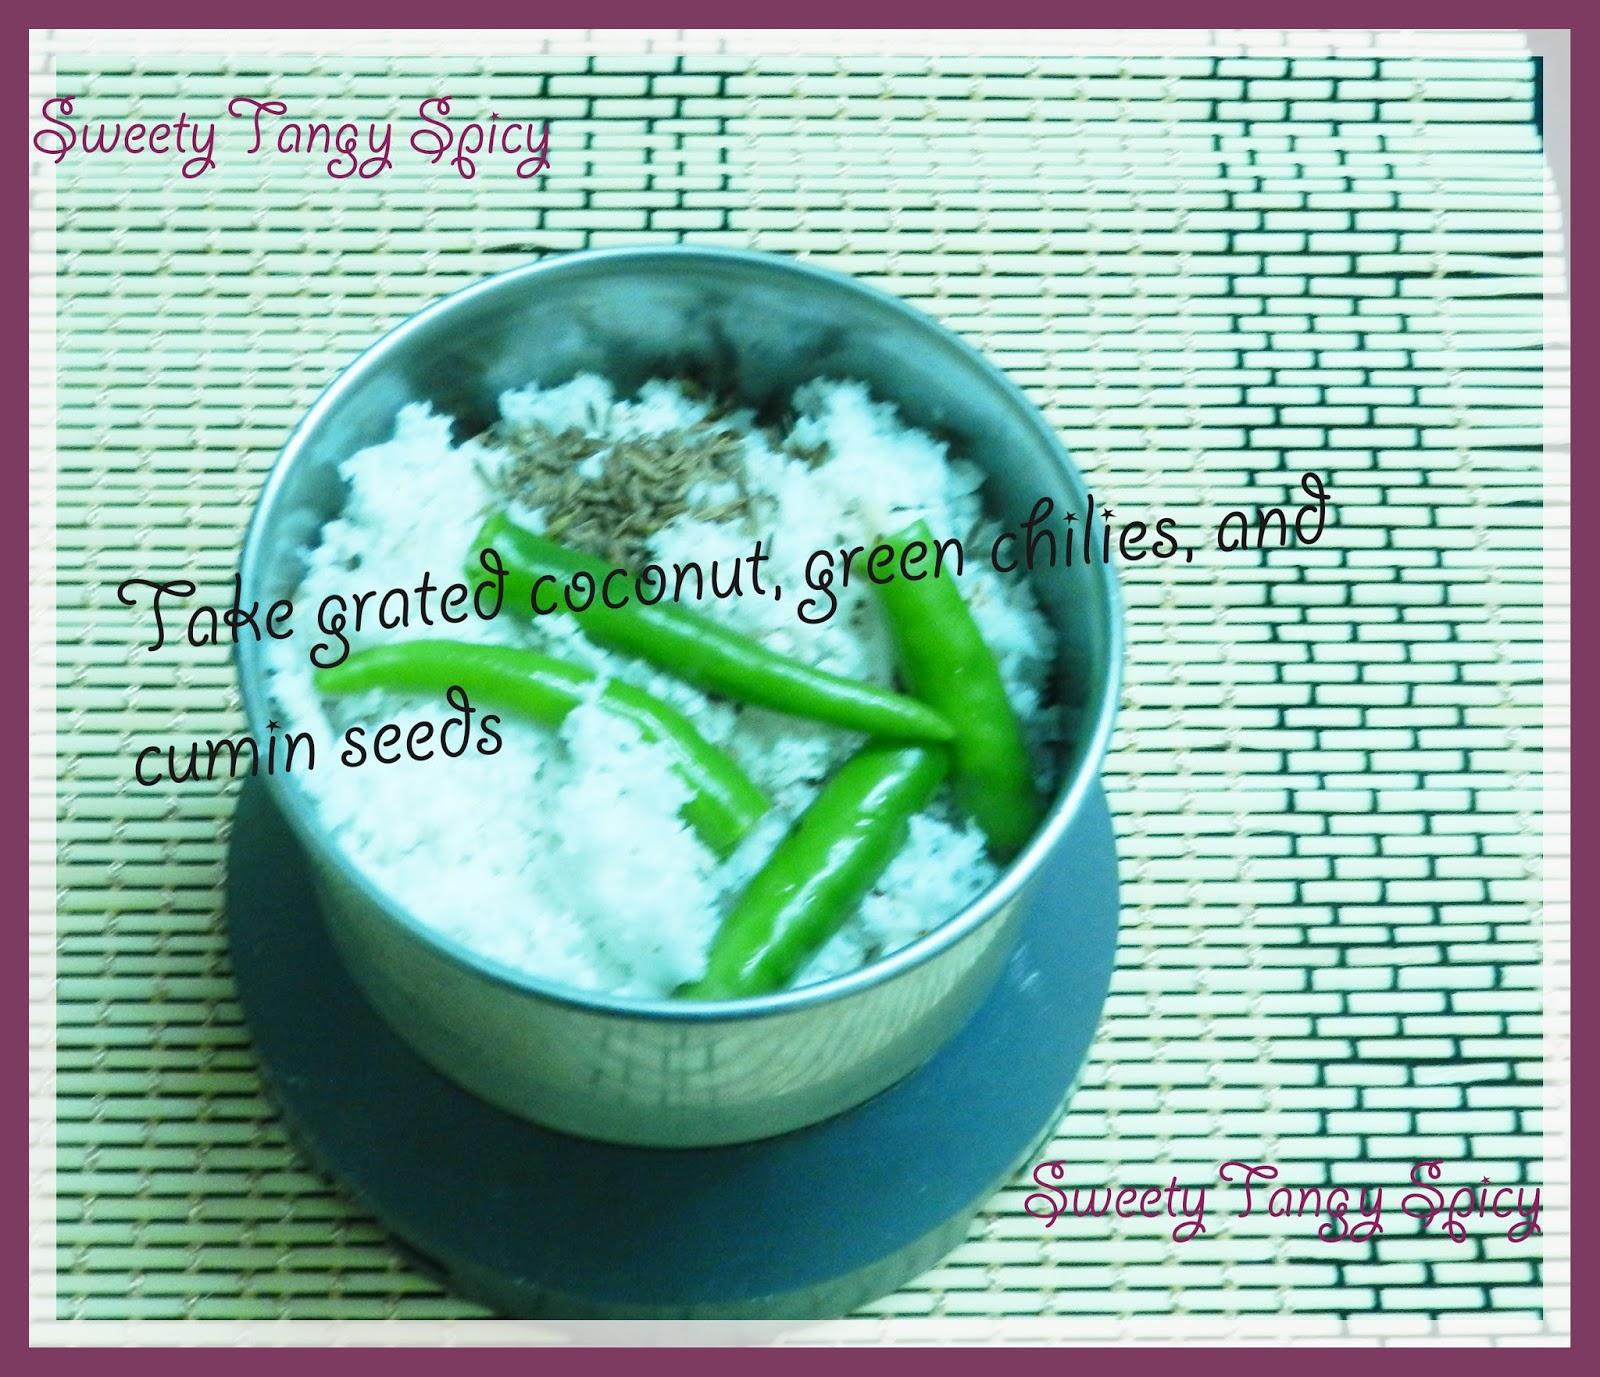 Sweety Tangy Spicy: Padavalanga Kootu / Snake Gourd Bengal Gram Stir Fry